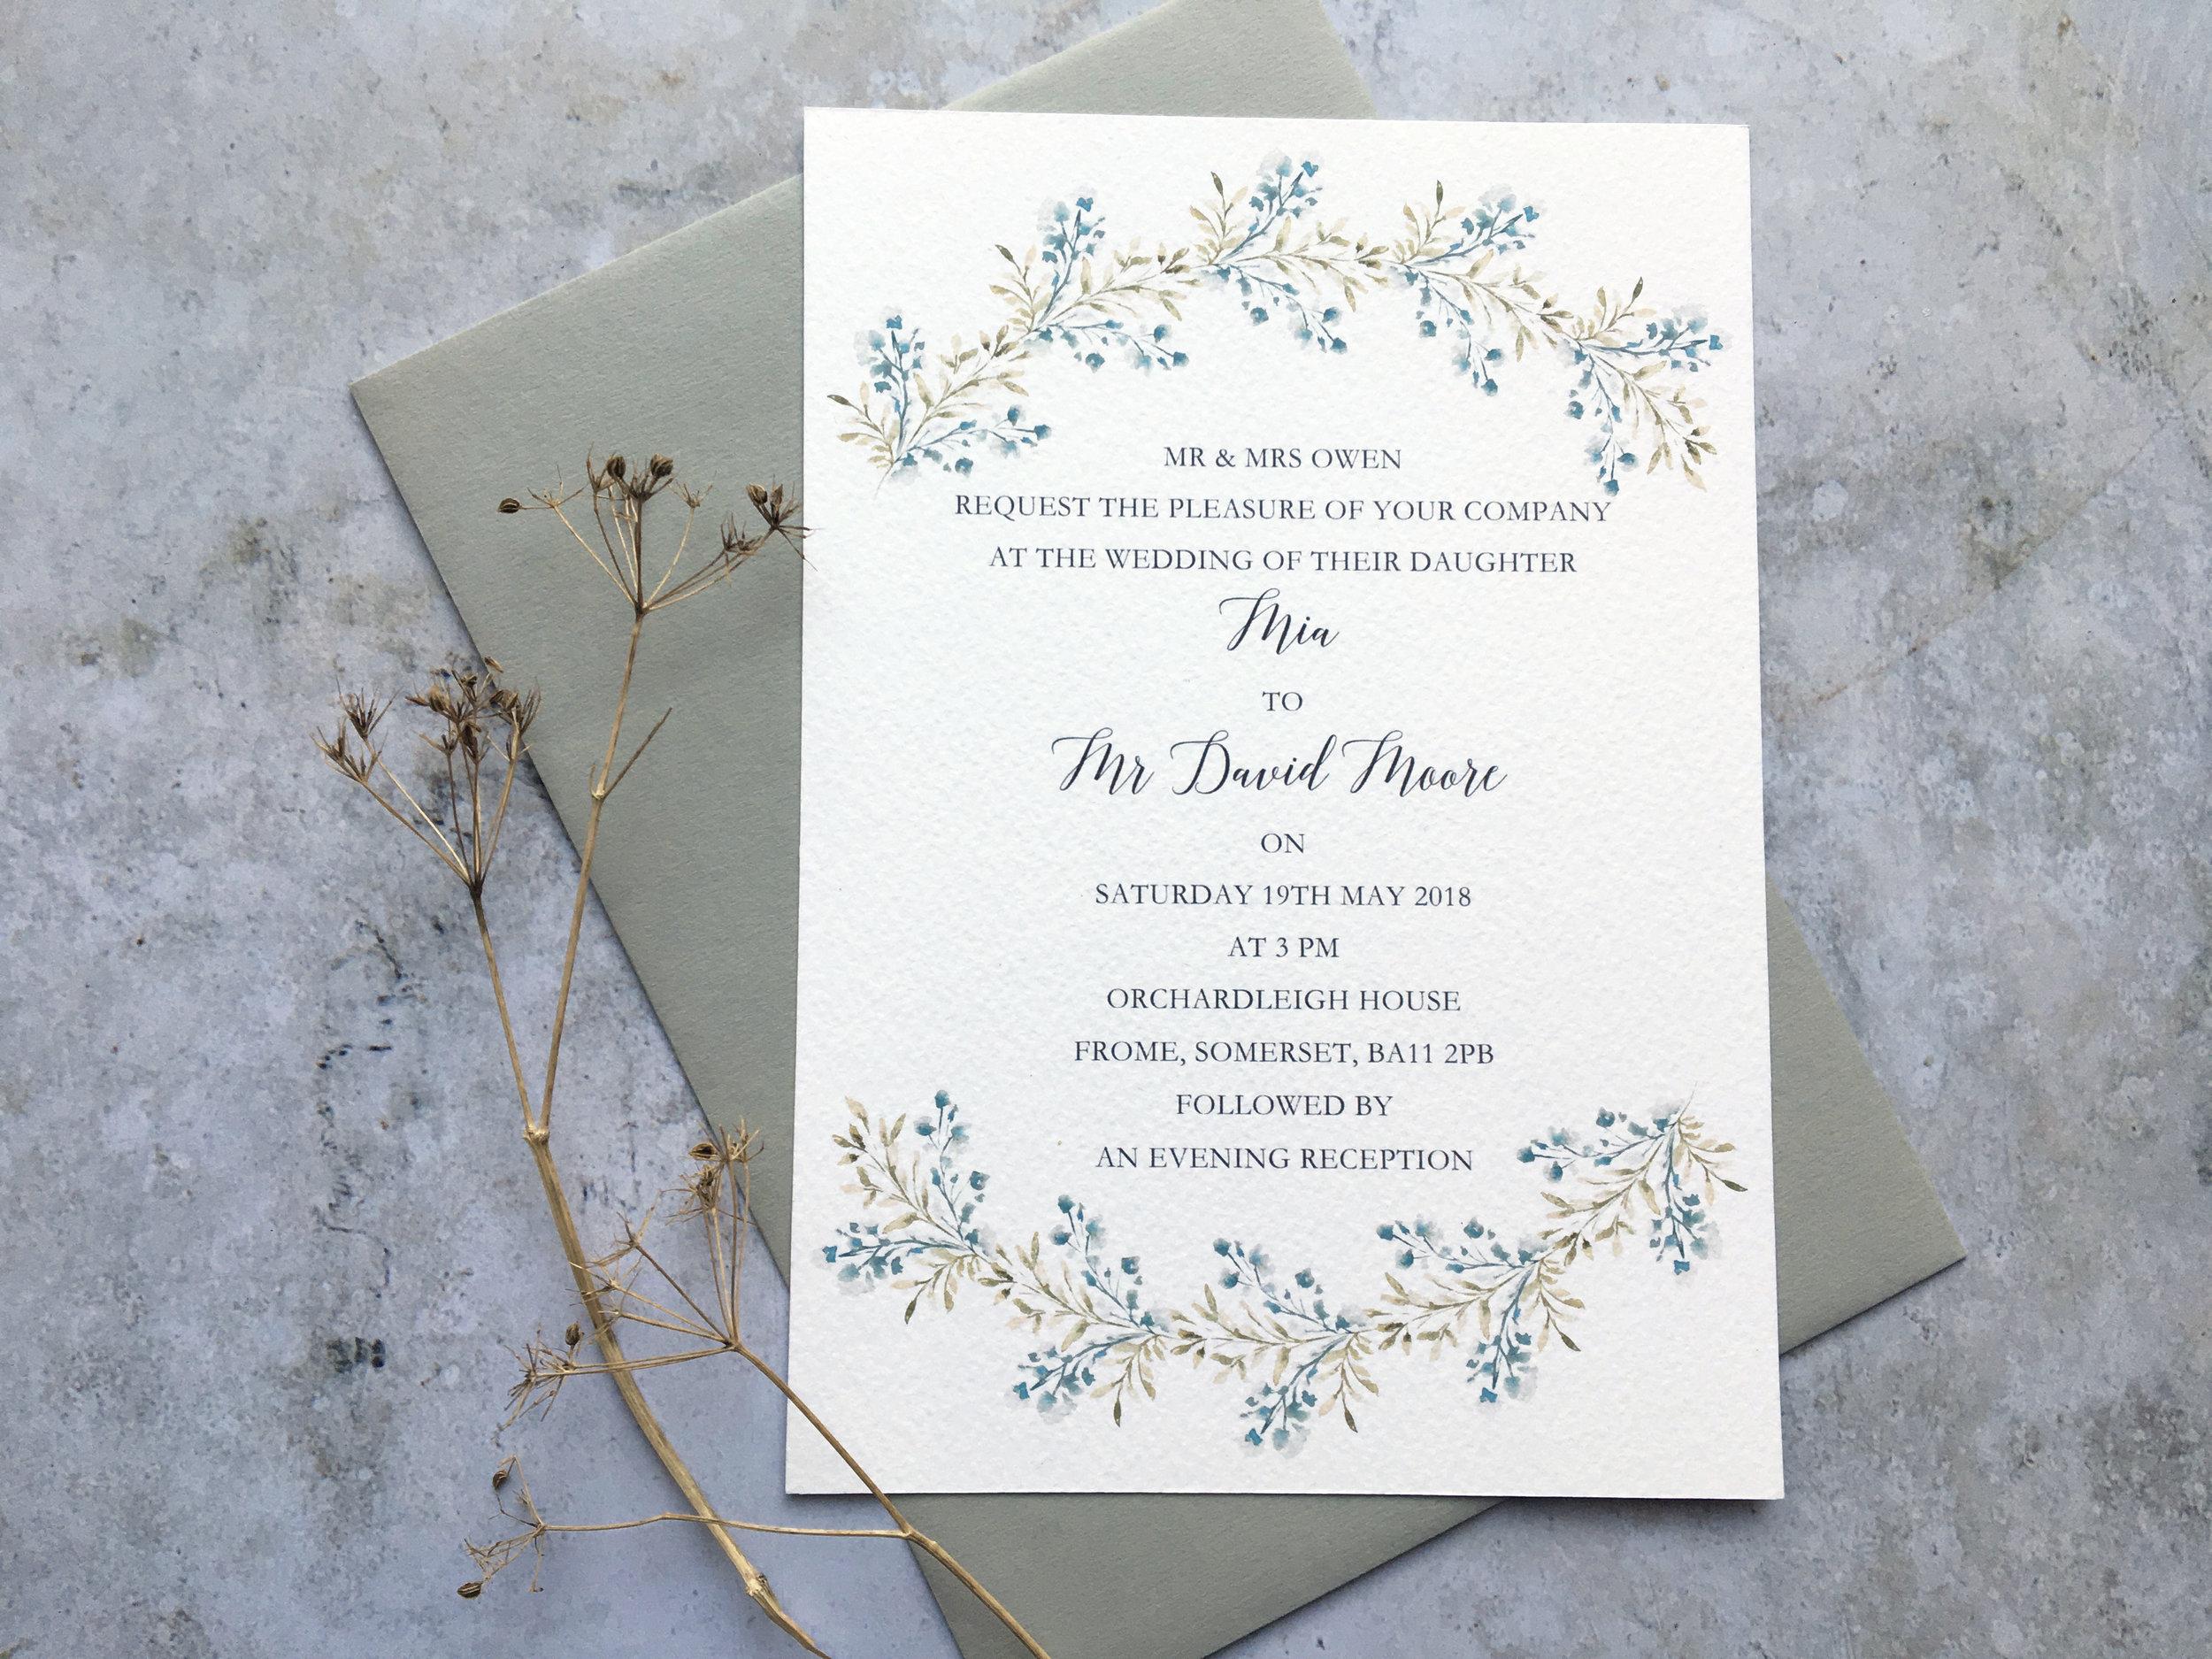 Enchanted wreath invite.jpg